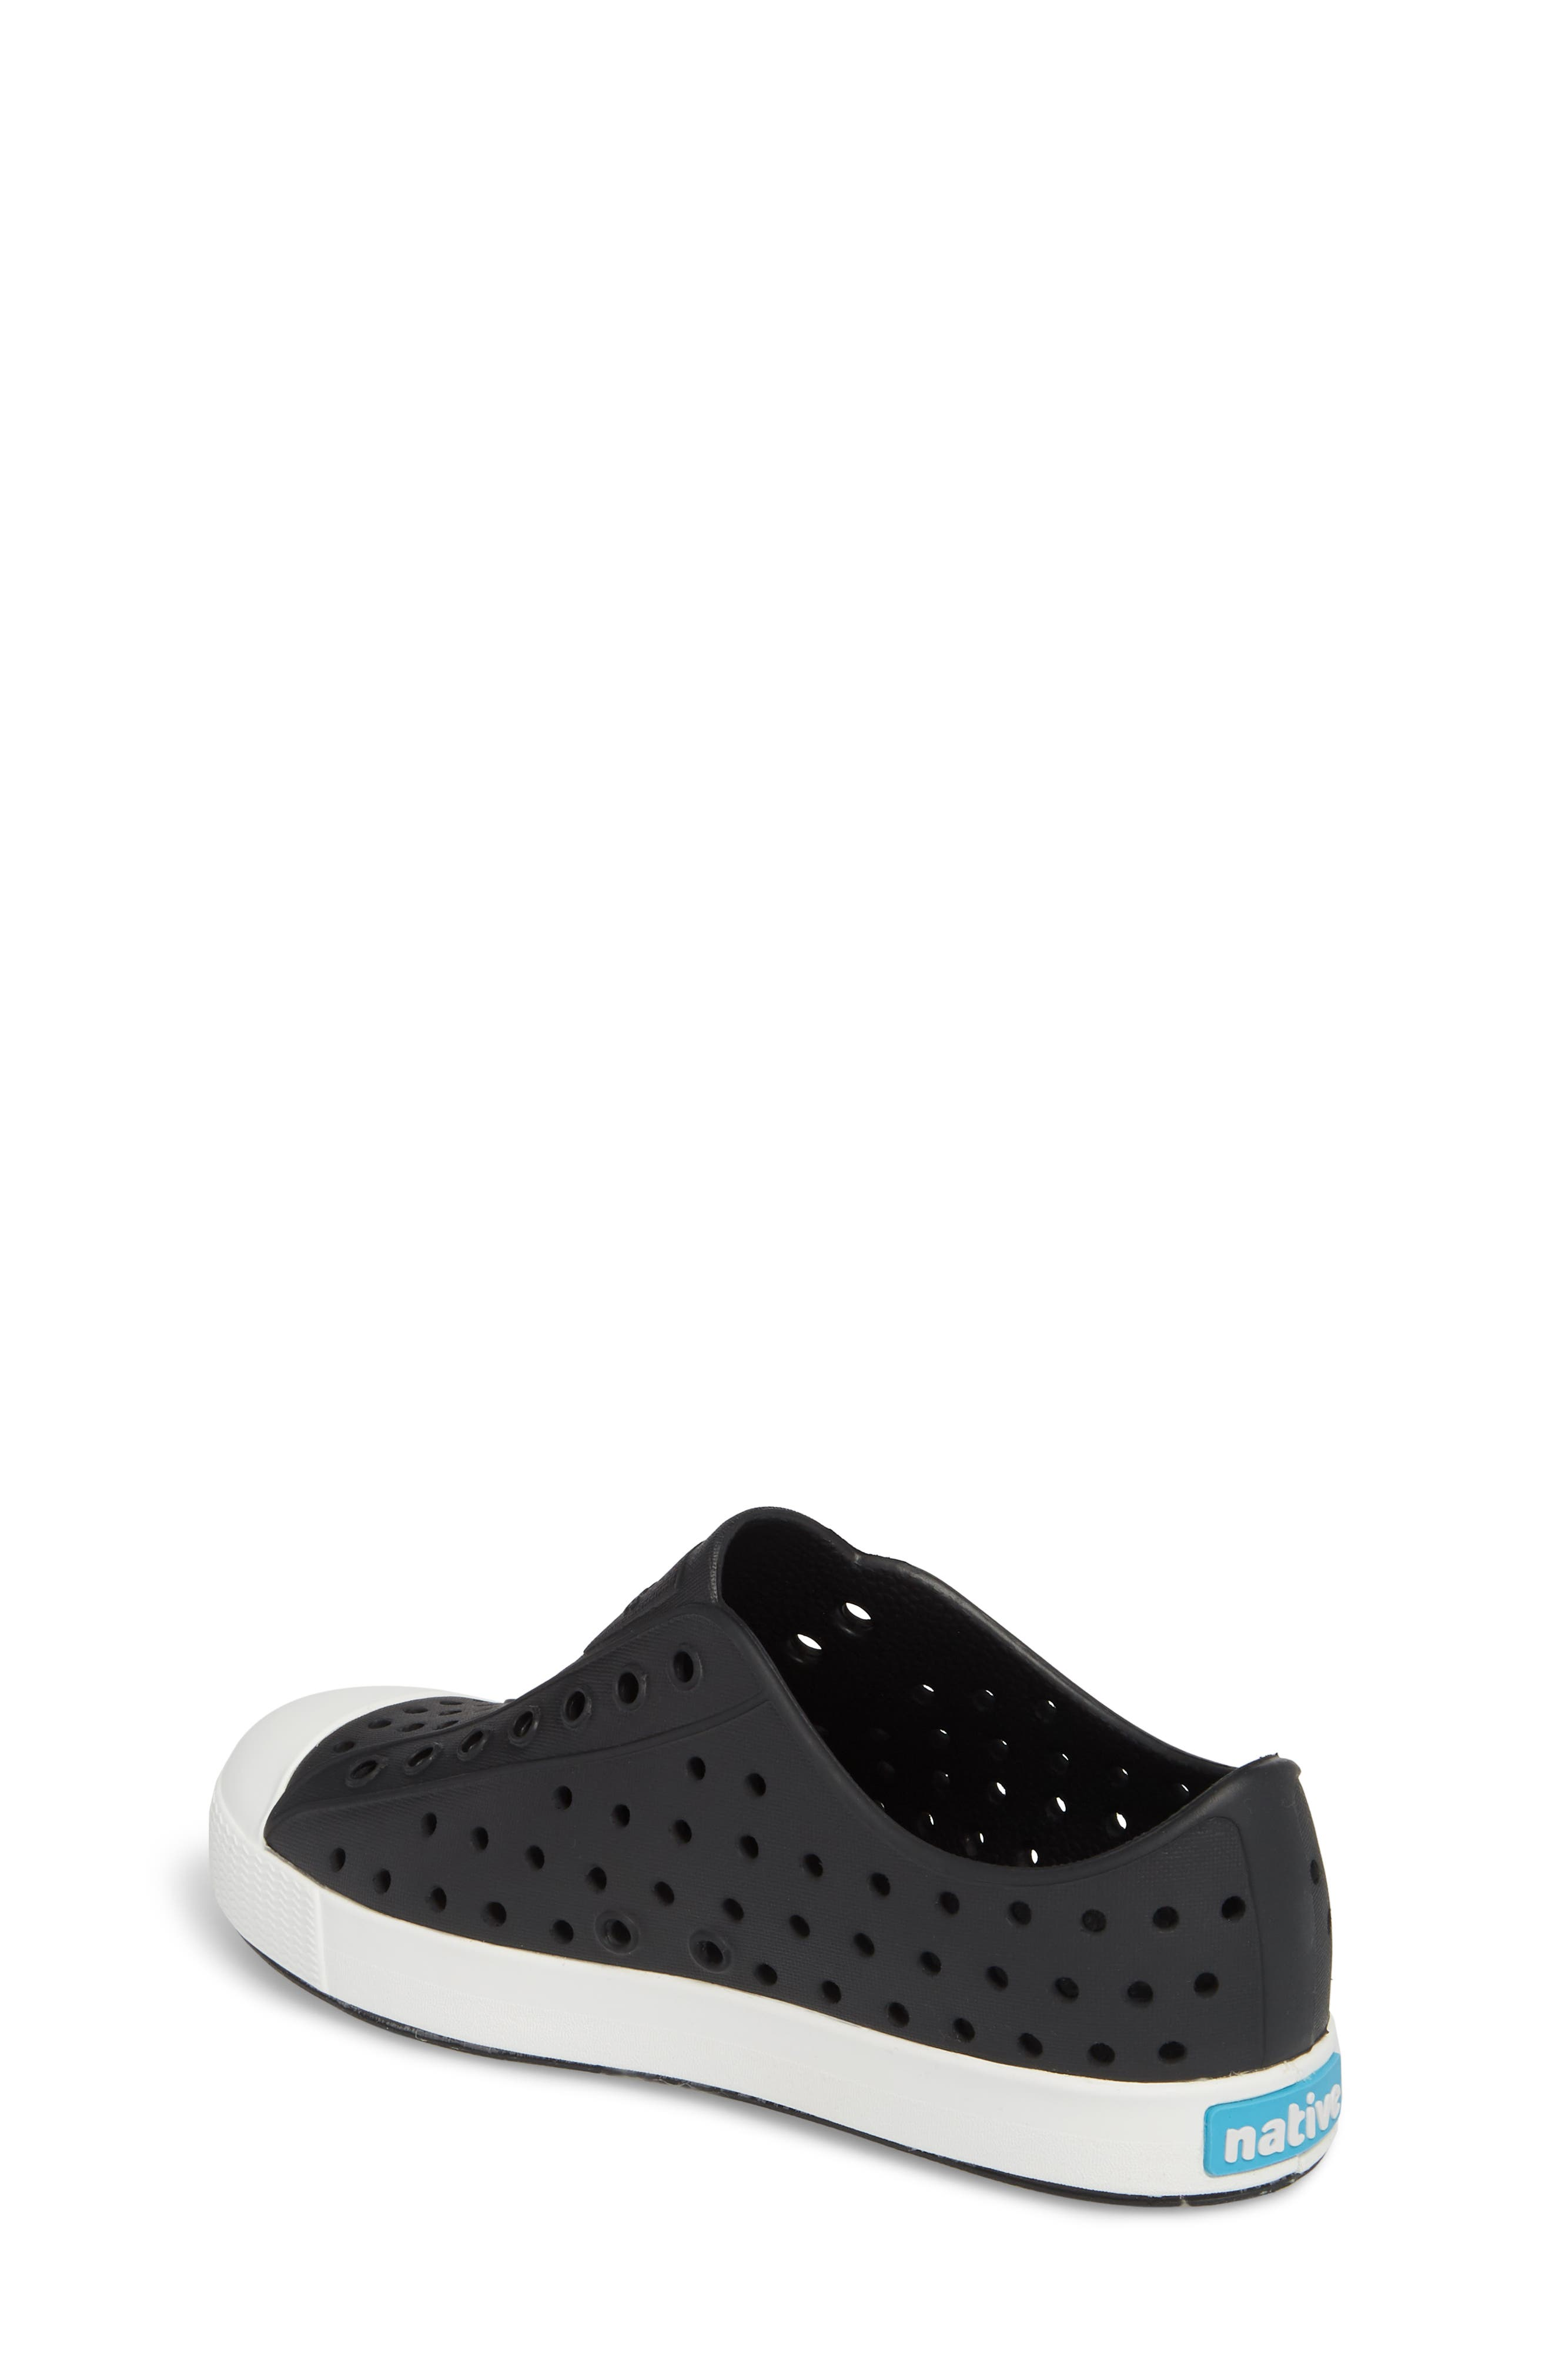 'Jefferson' Water Friendly Slip-On Sneaker,                             Alternate thumbnail 69, color,